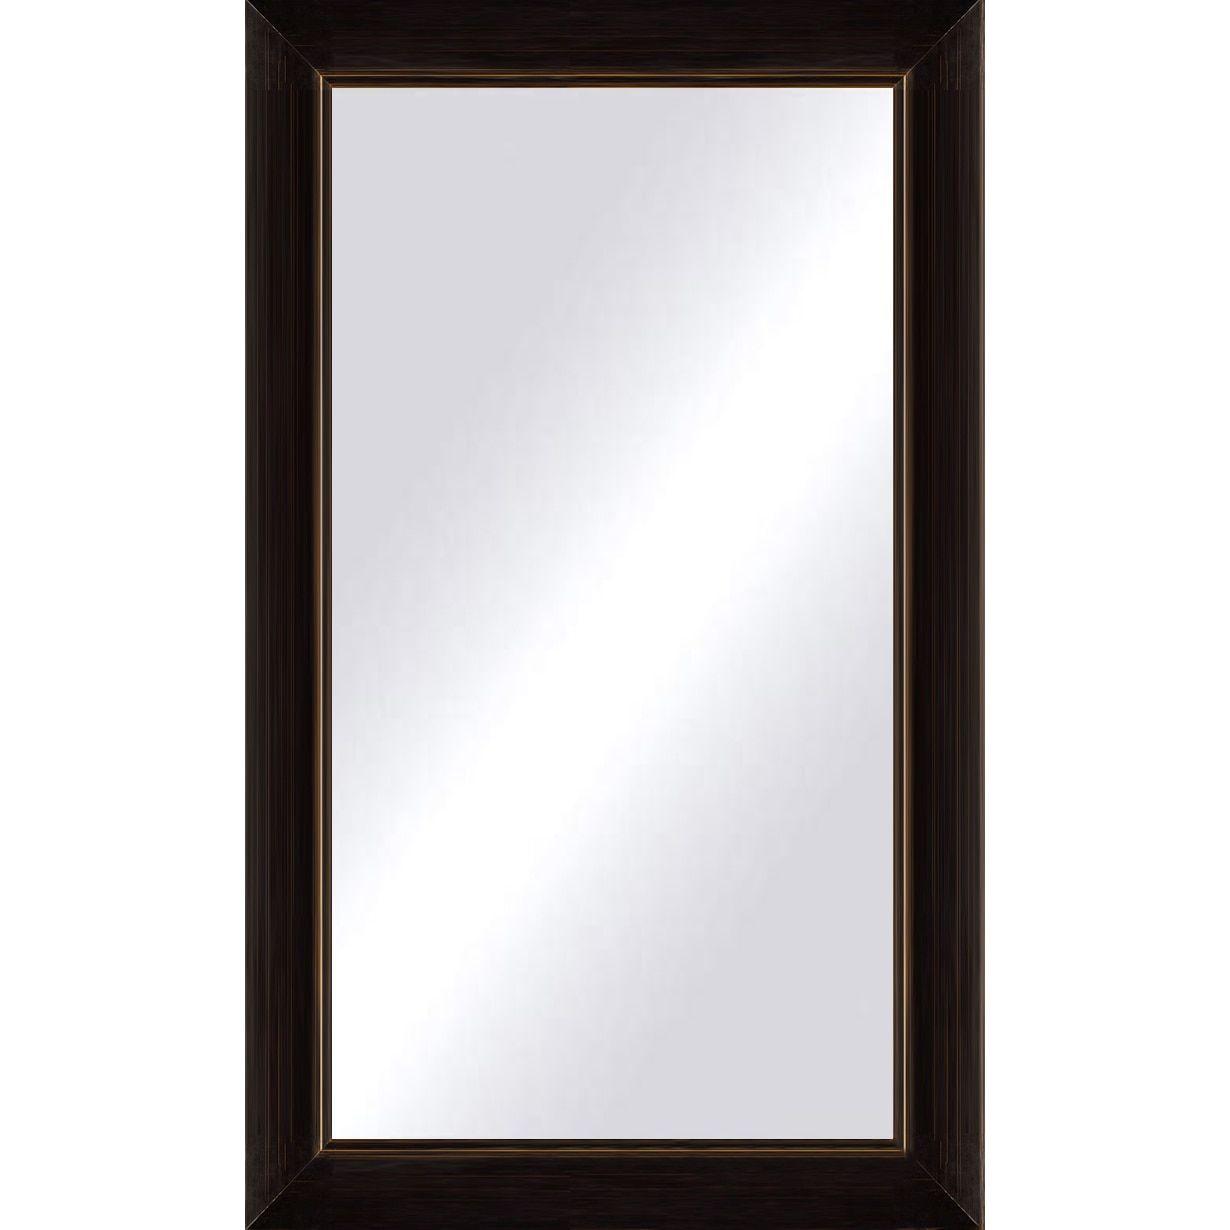 Oversize Black Copper Framed Mirror 44 X 60 Blackbrown Copper